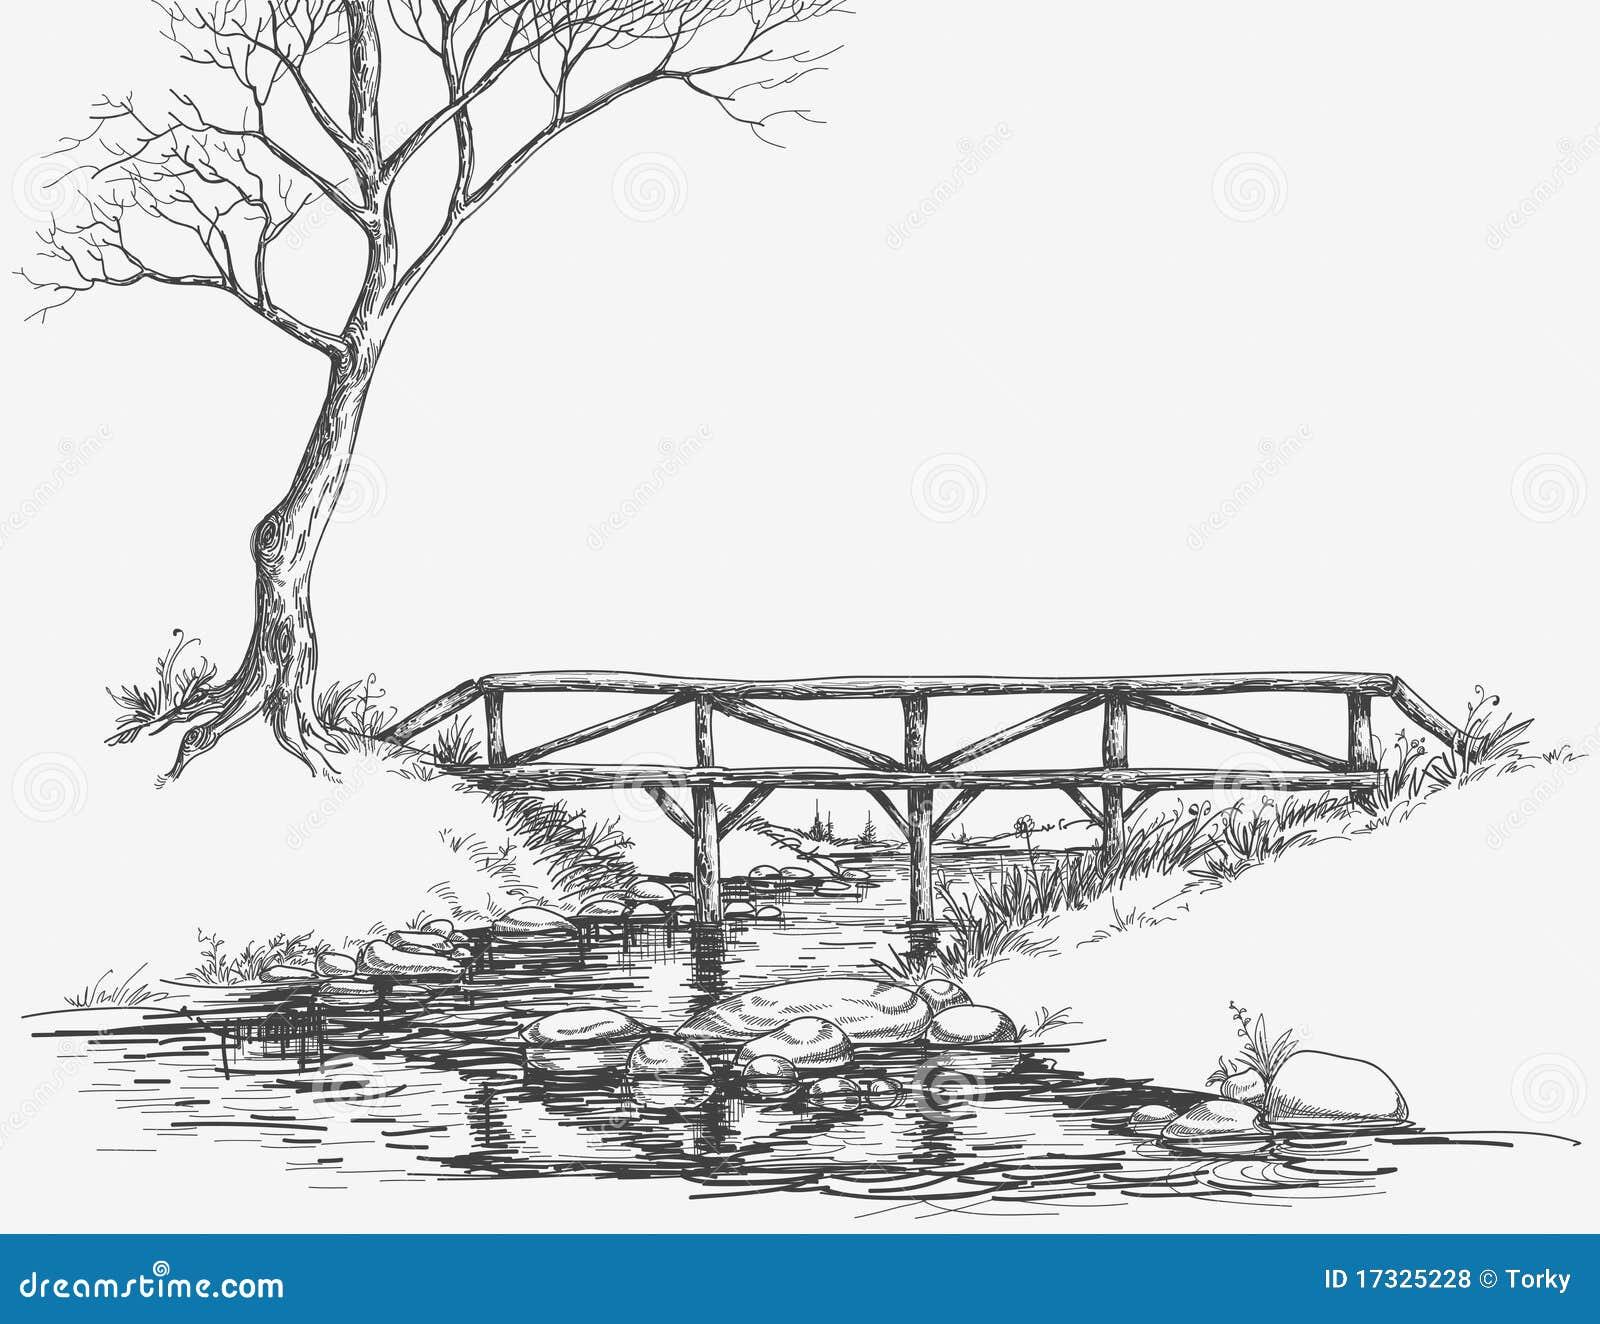 Bridge Over River Royalty Free Stock Photos Image 17325228